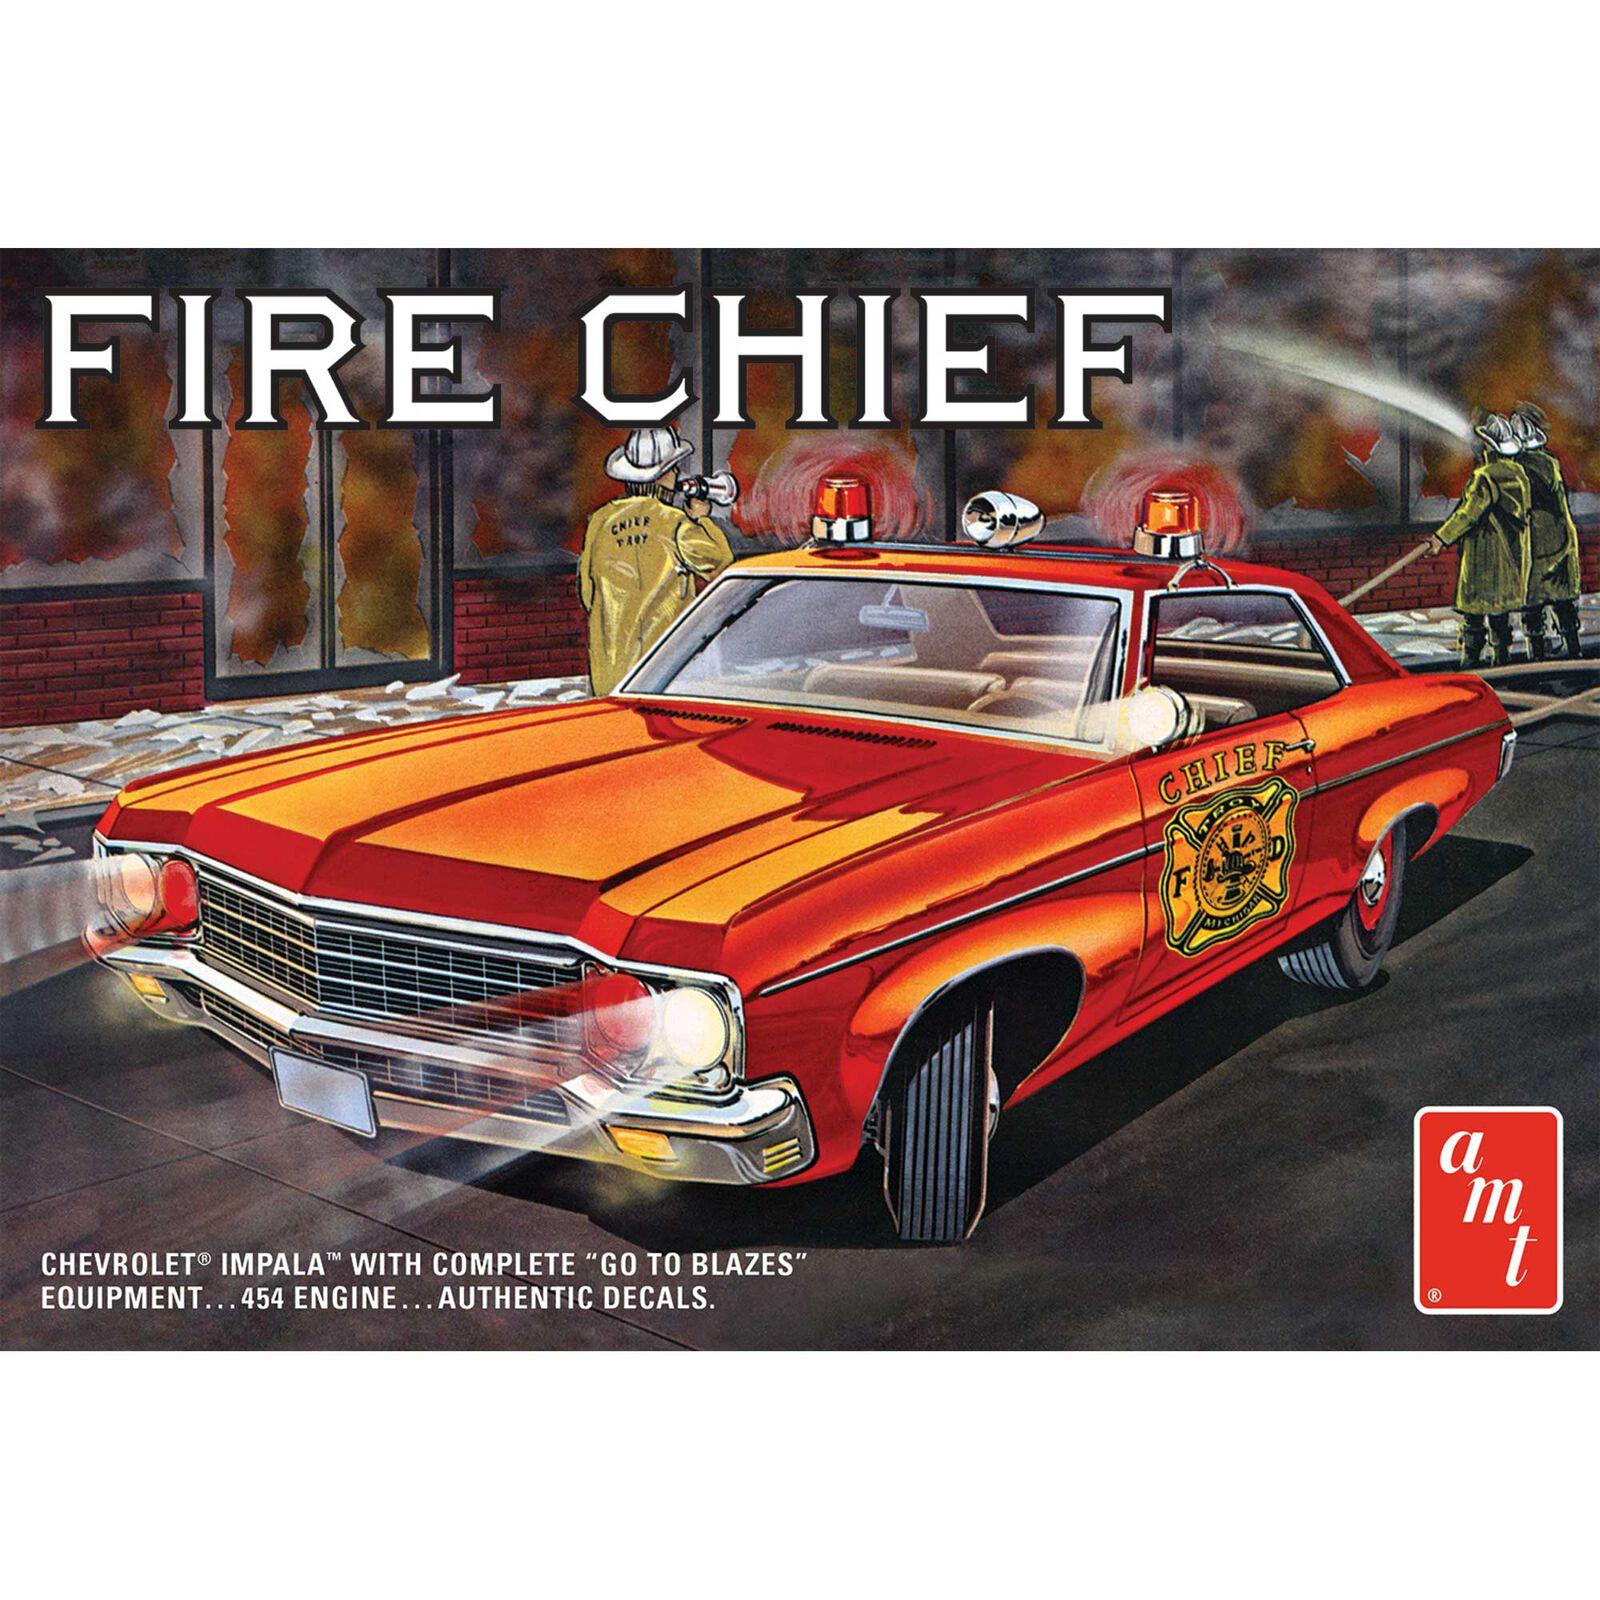 1/25 1970 Chevy Impala Fire Chief